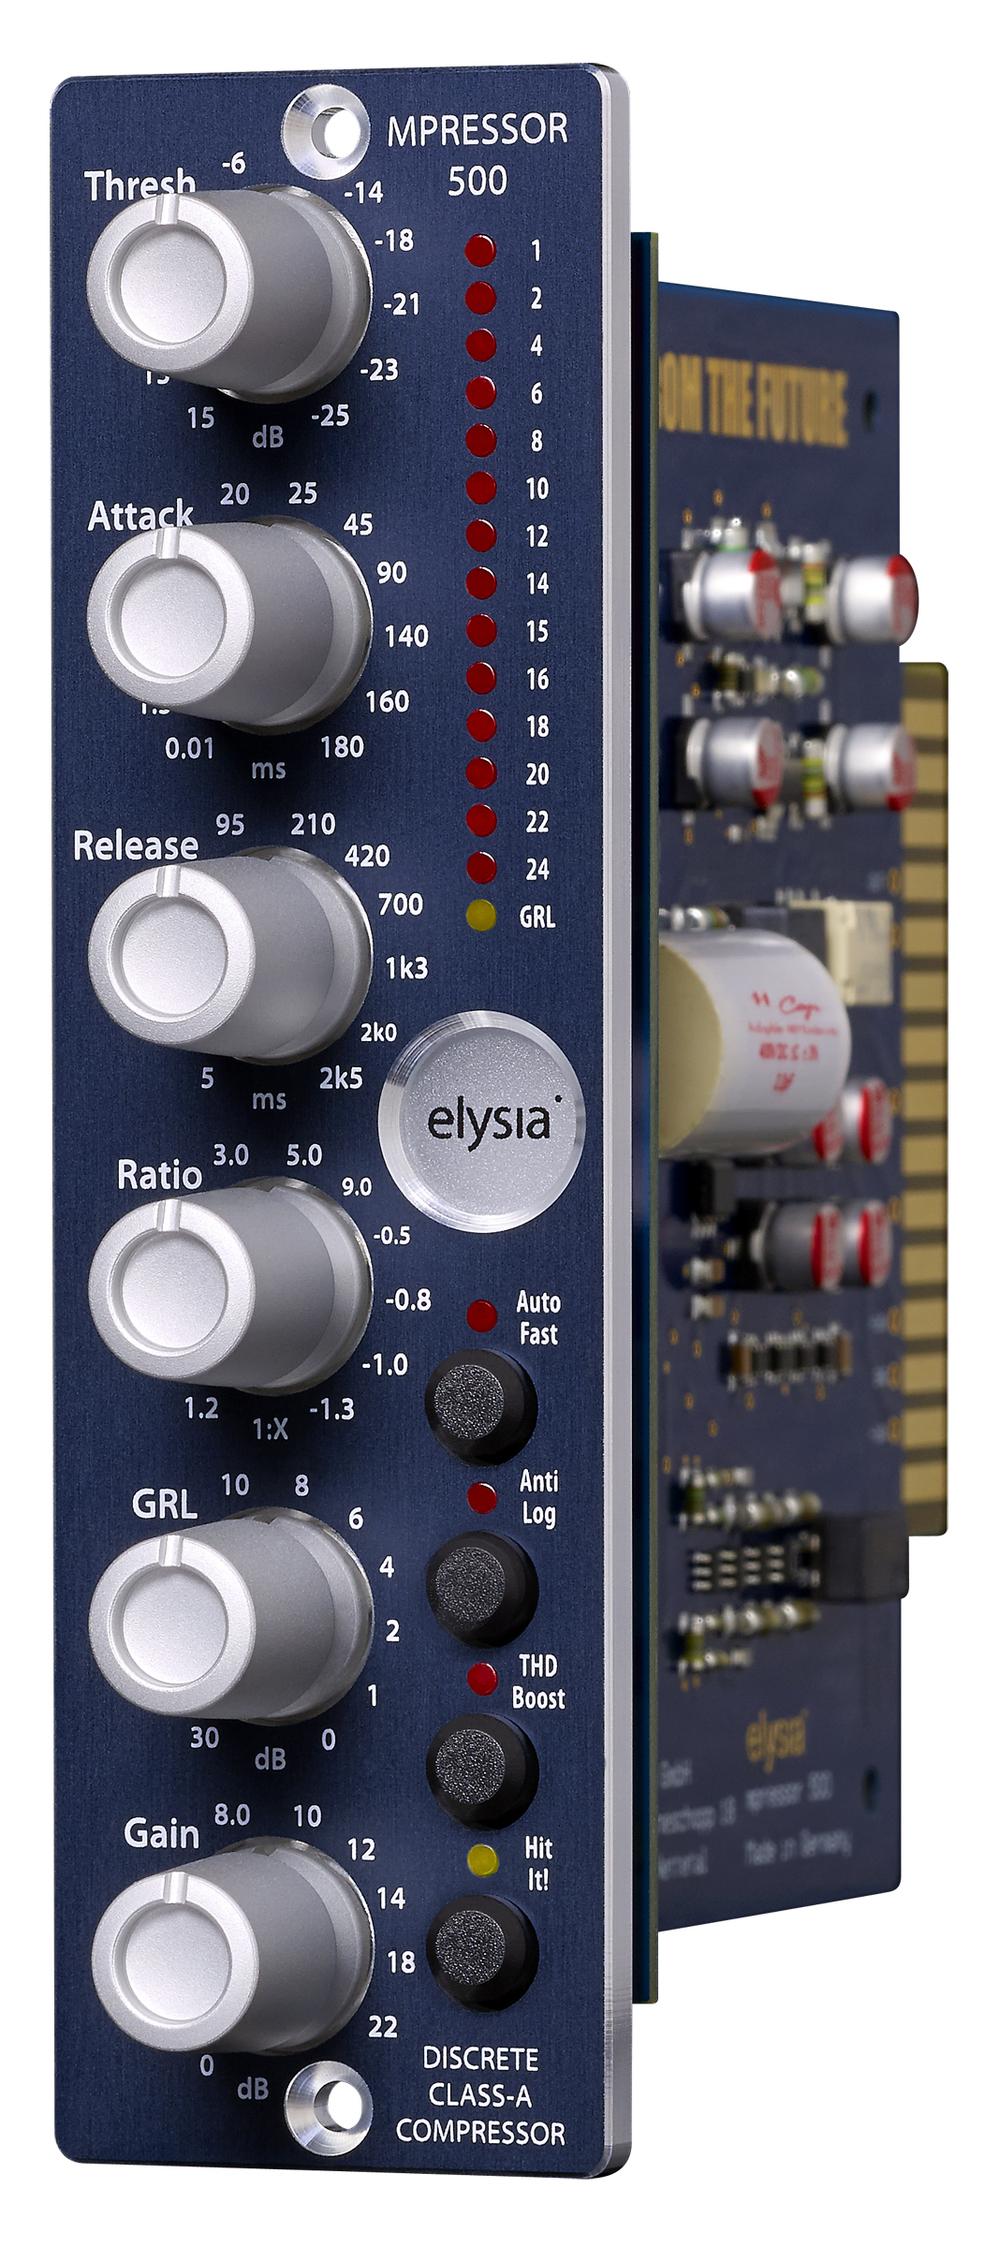 News: elysia mpressor als 500er-Modul